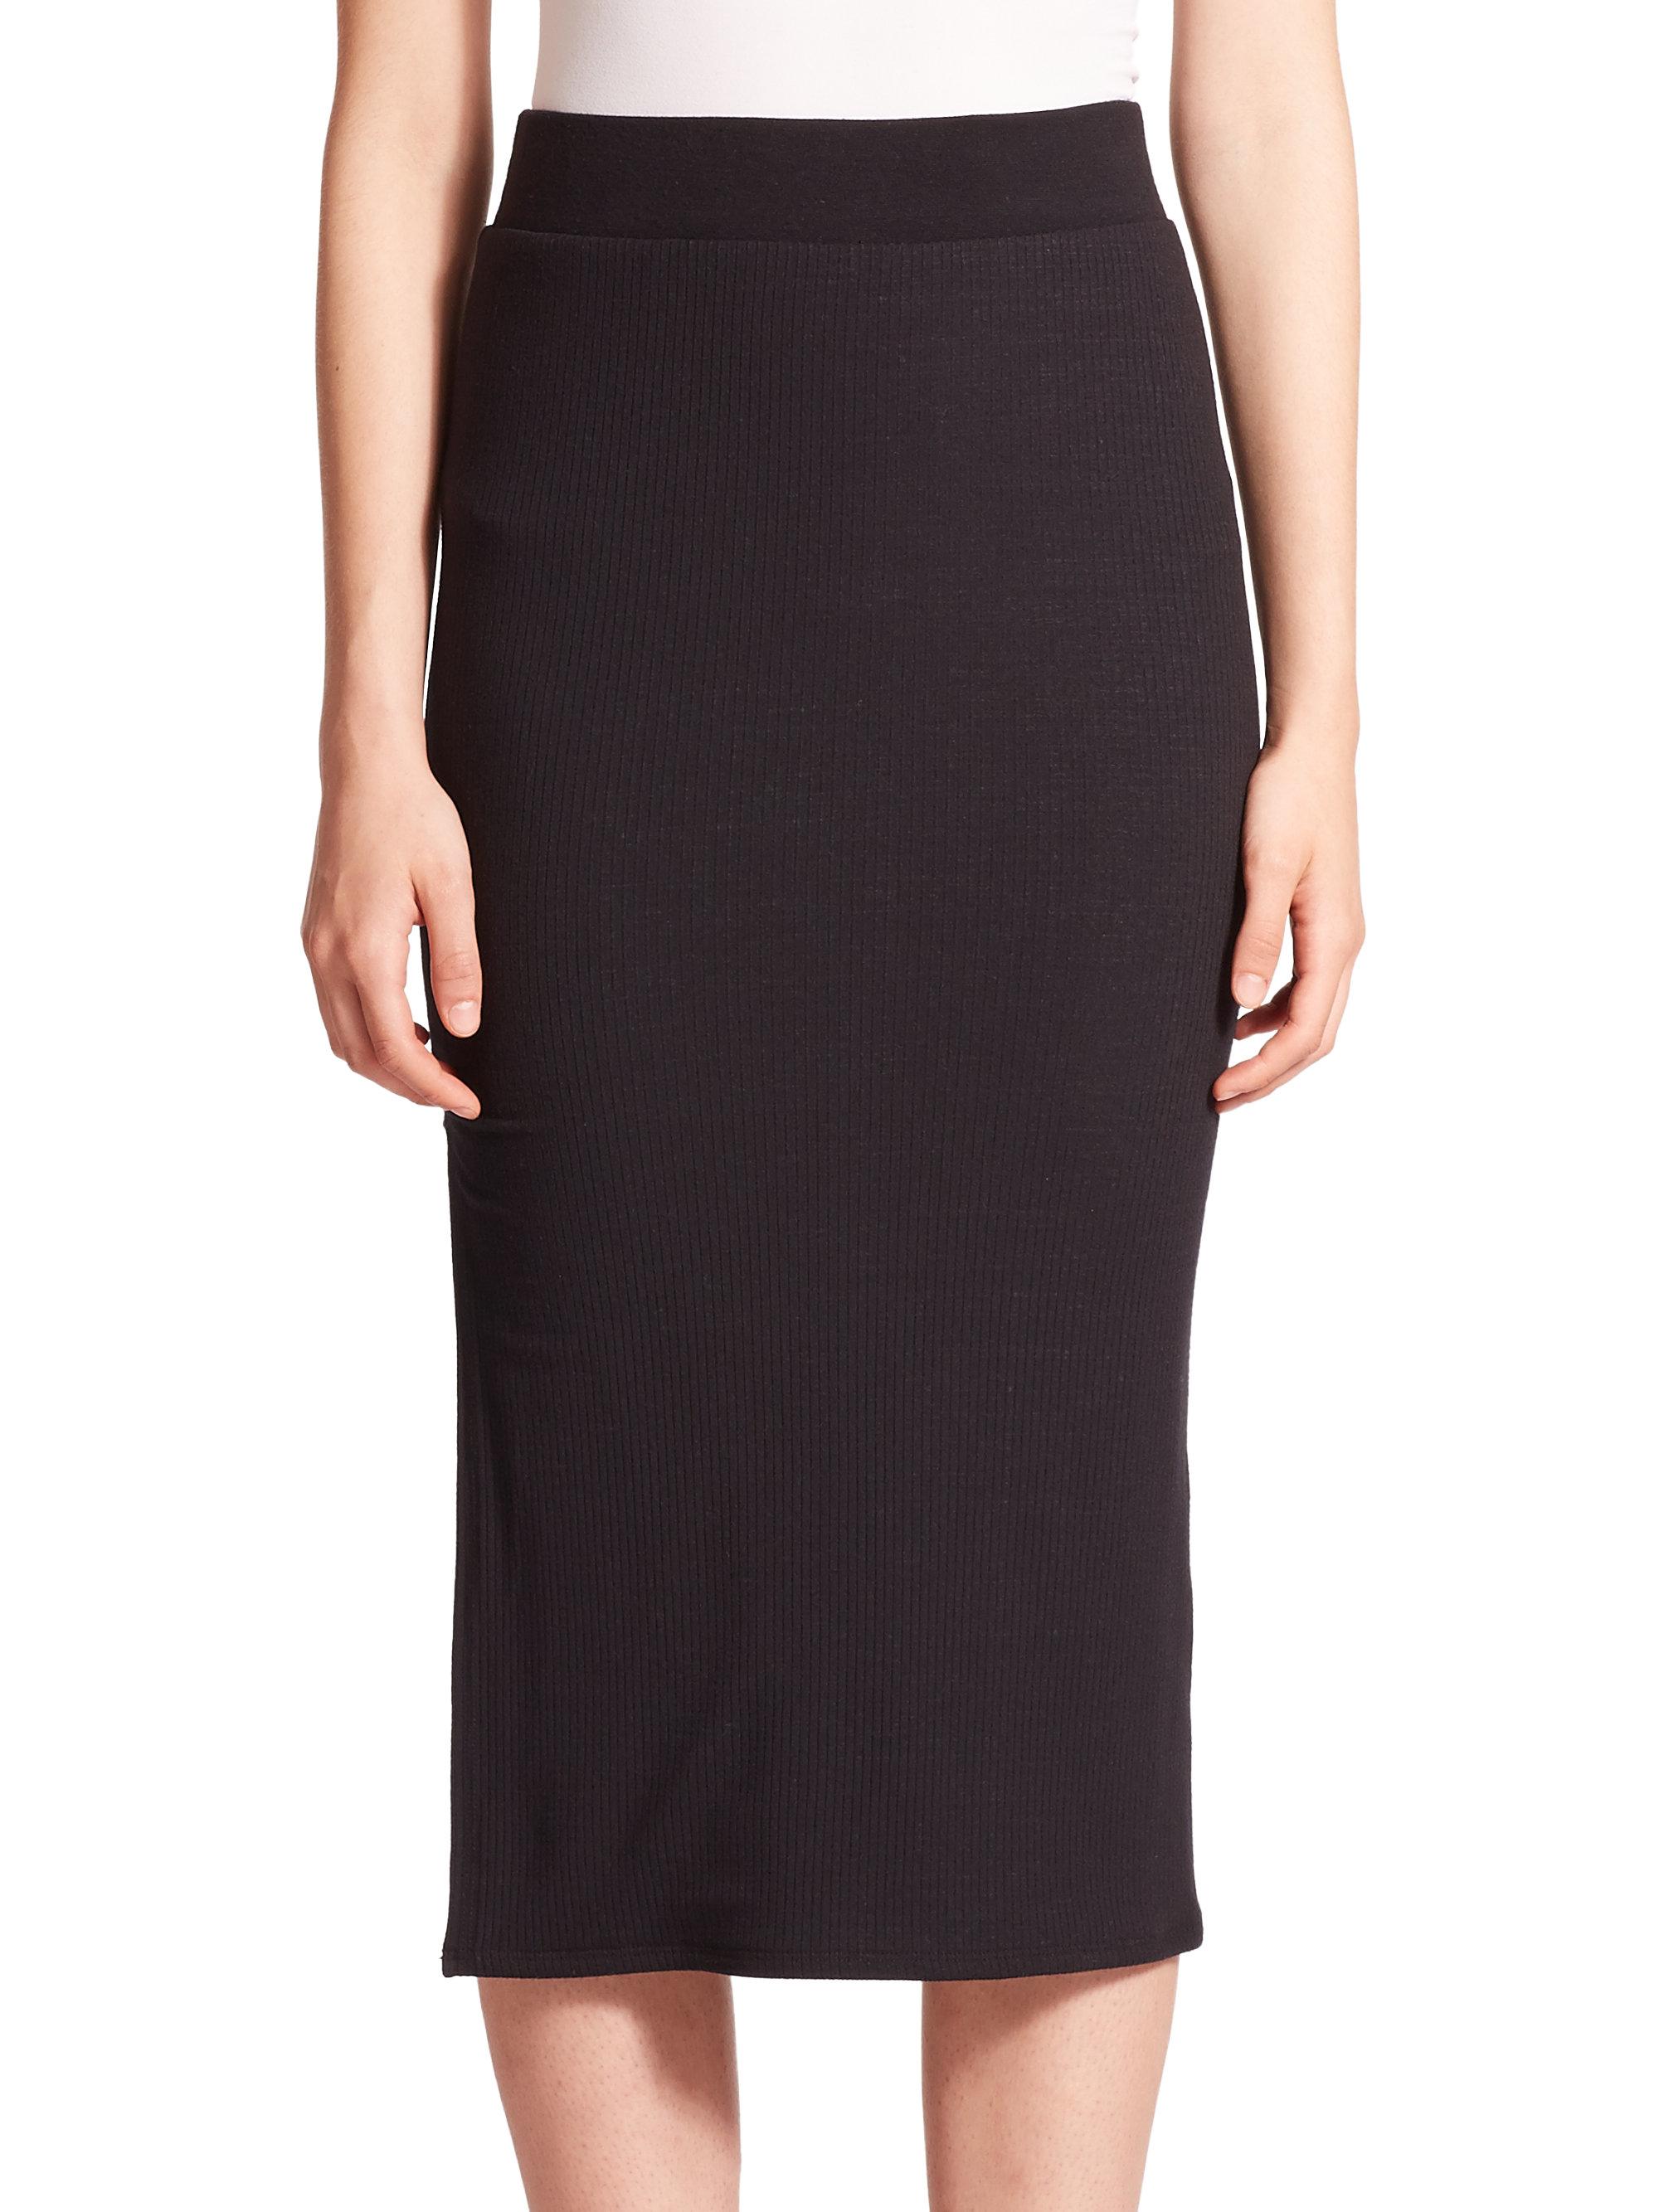 atm ribbed midi pencil skirt in black lyst